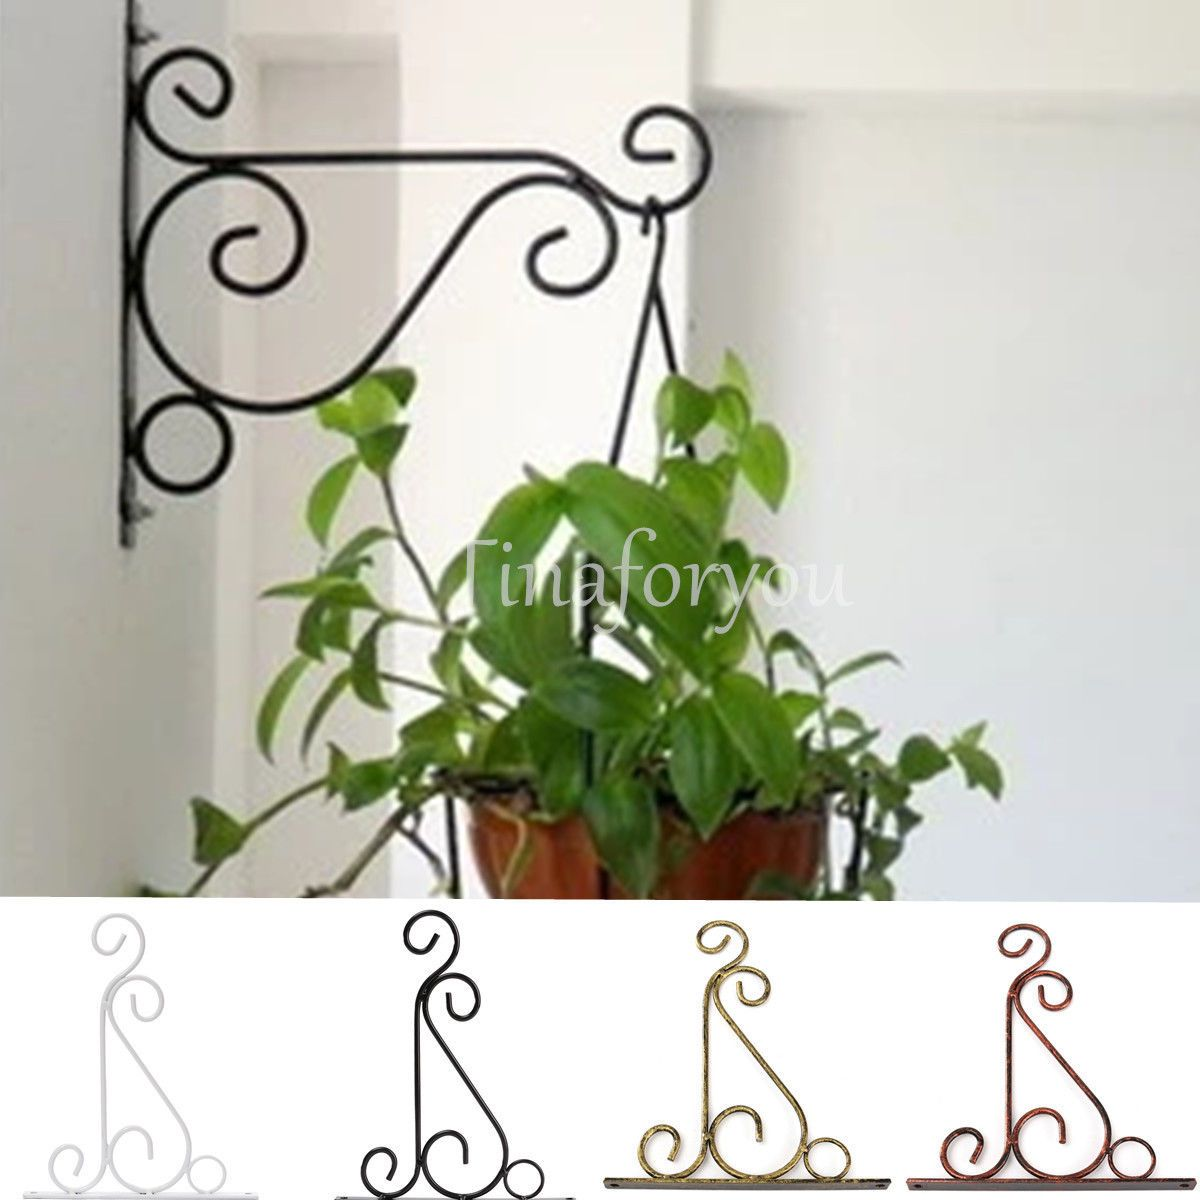 Black Scroll Cast Iron Garden Hanging Basket Wall Bracket Lantern Hanger Hook